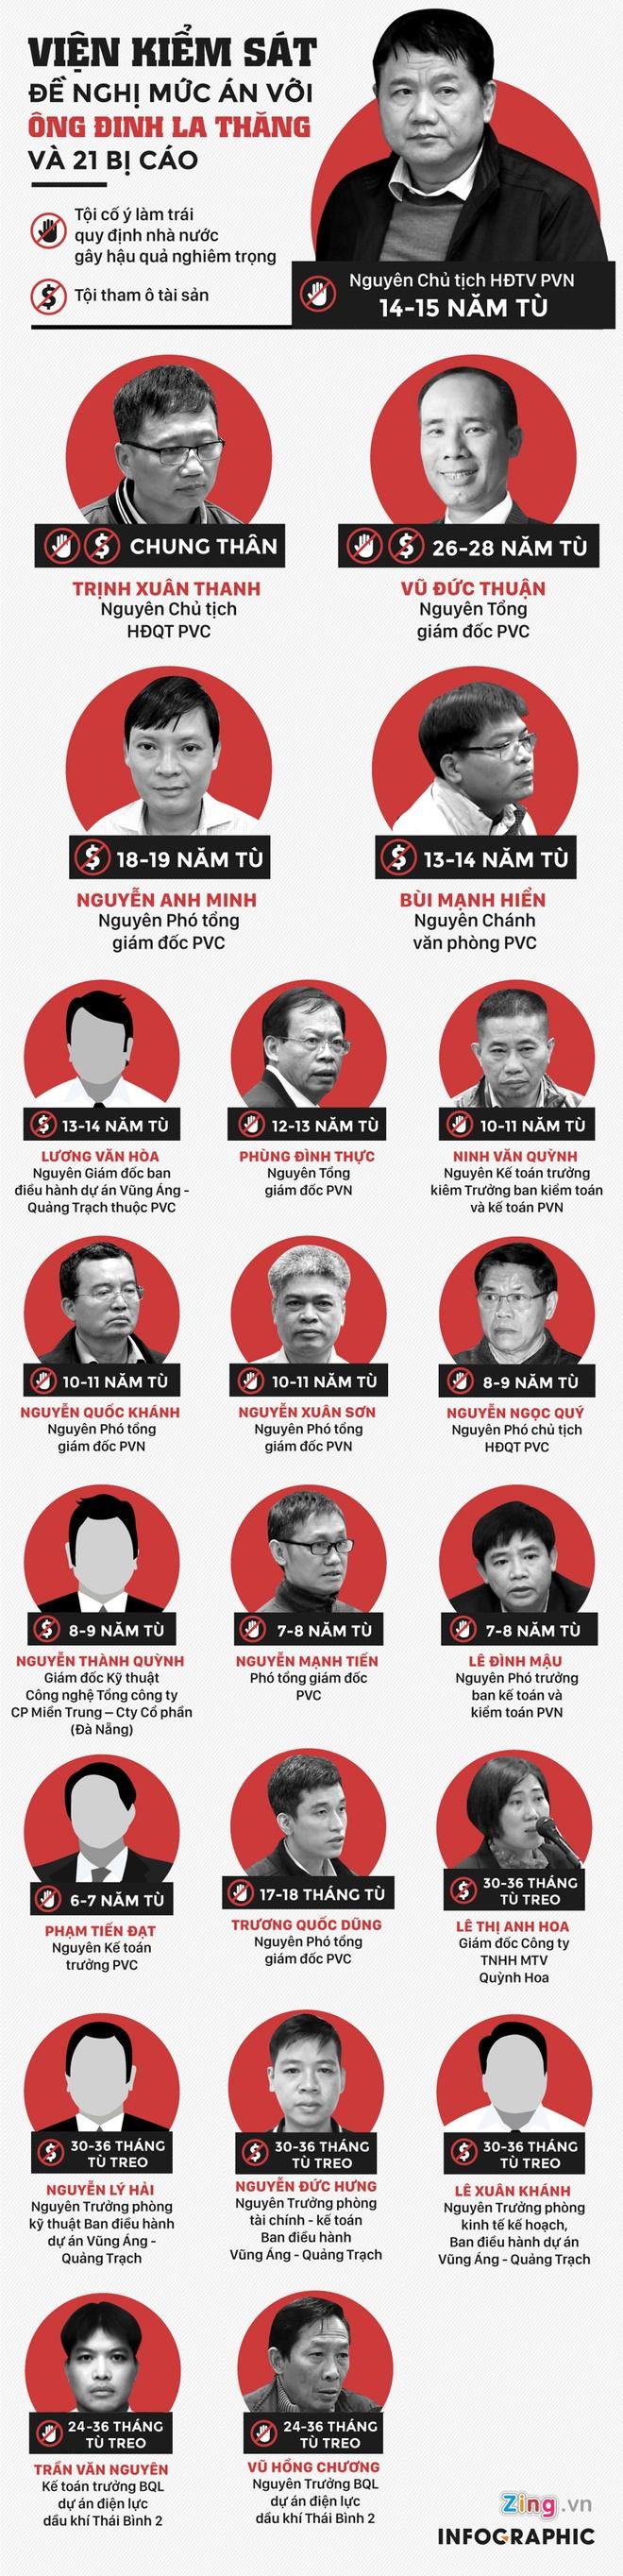 6 thuoc cap cua ong Dinh La Thang duoc de nghi giam nhe hinh phat hinh anh 3